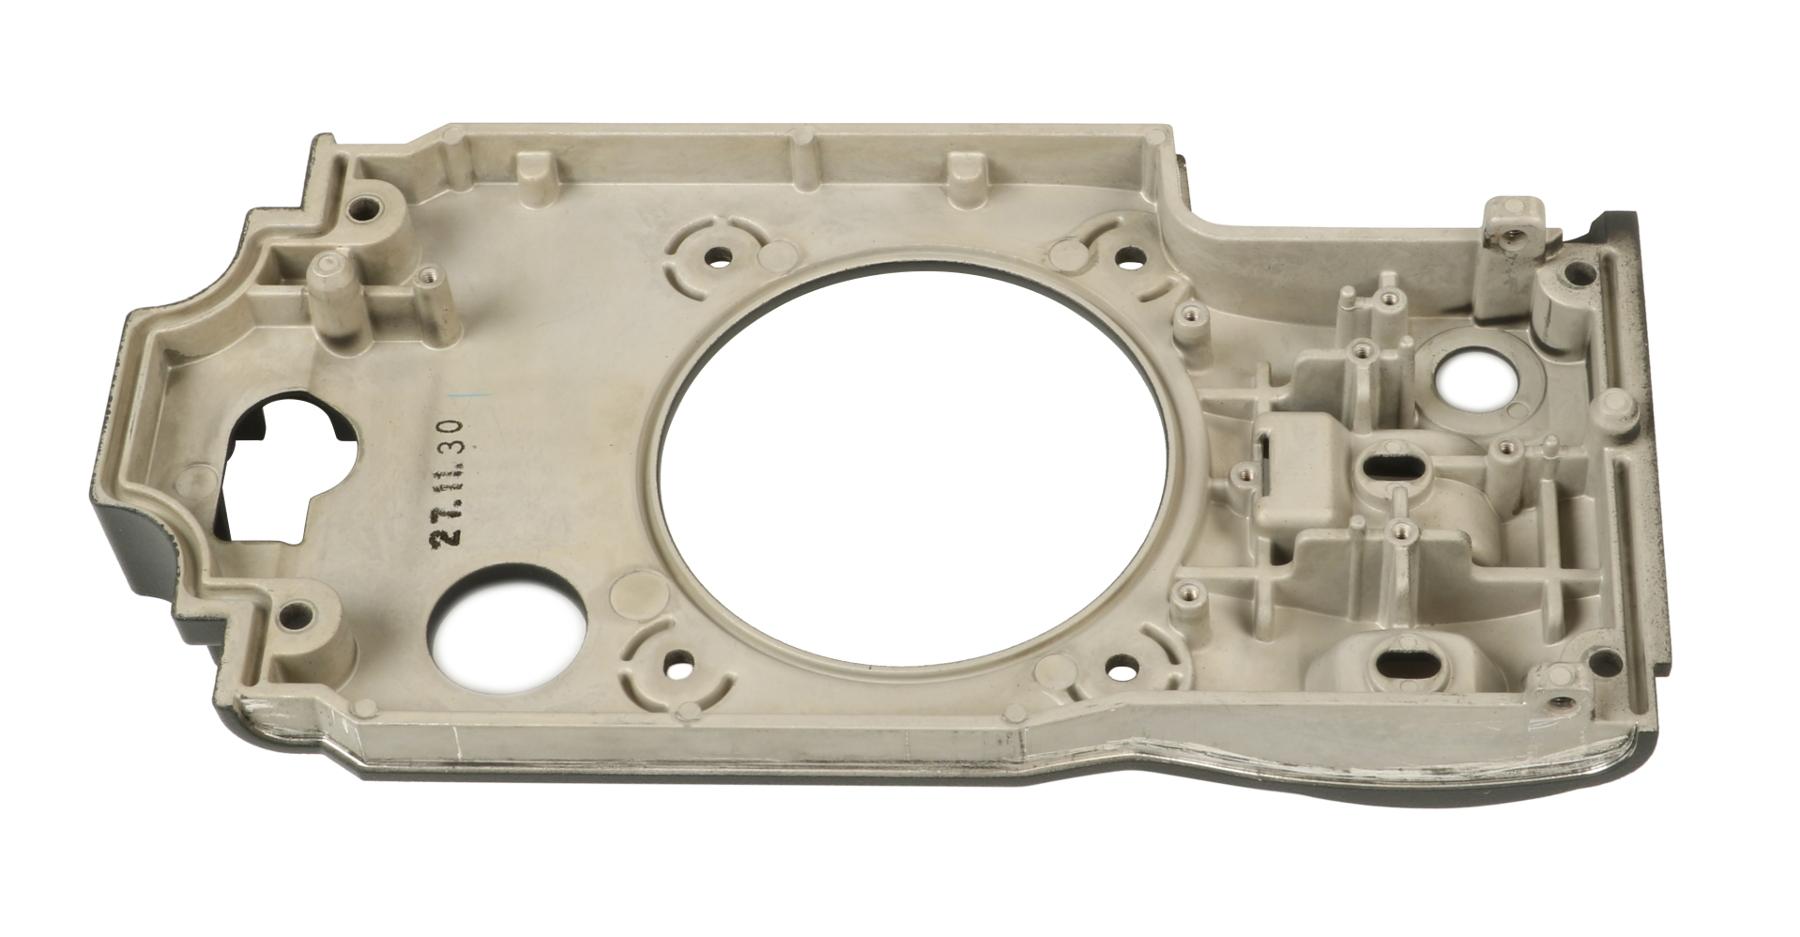 Front Case for AG-HPX370P